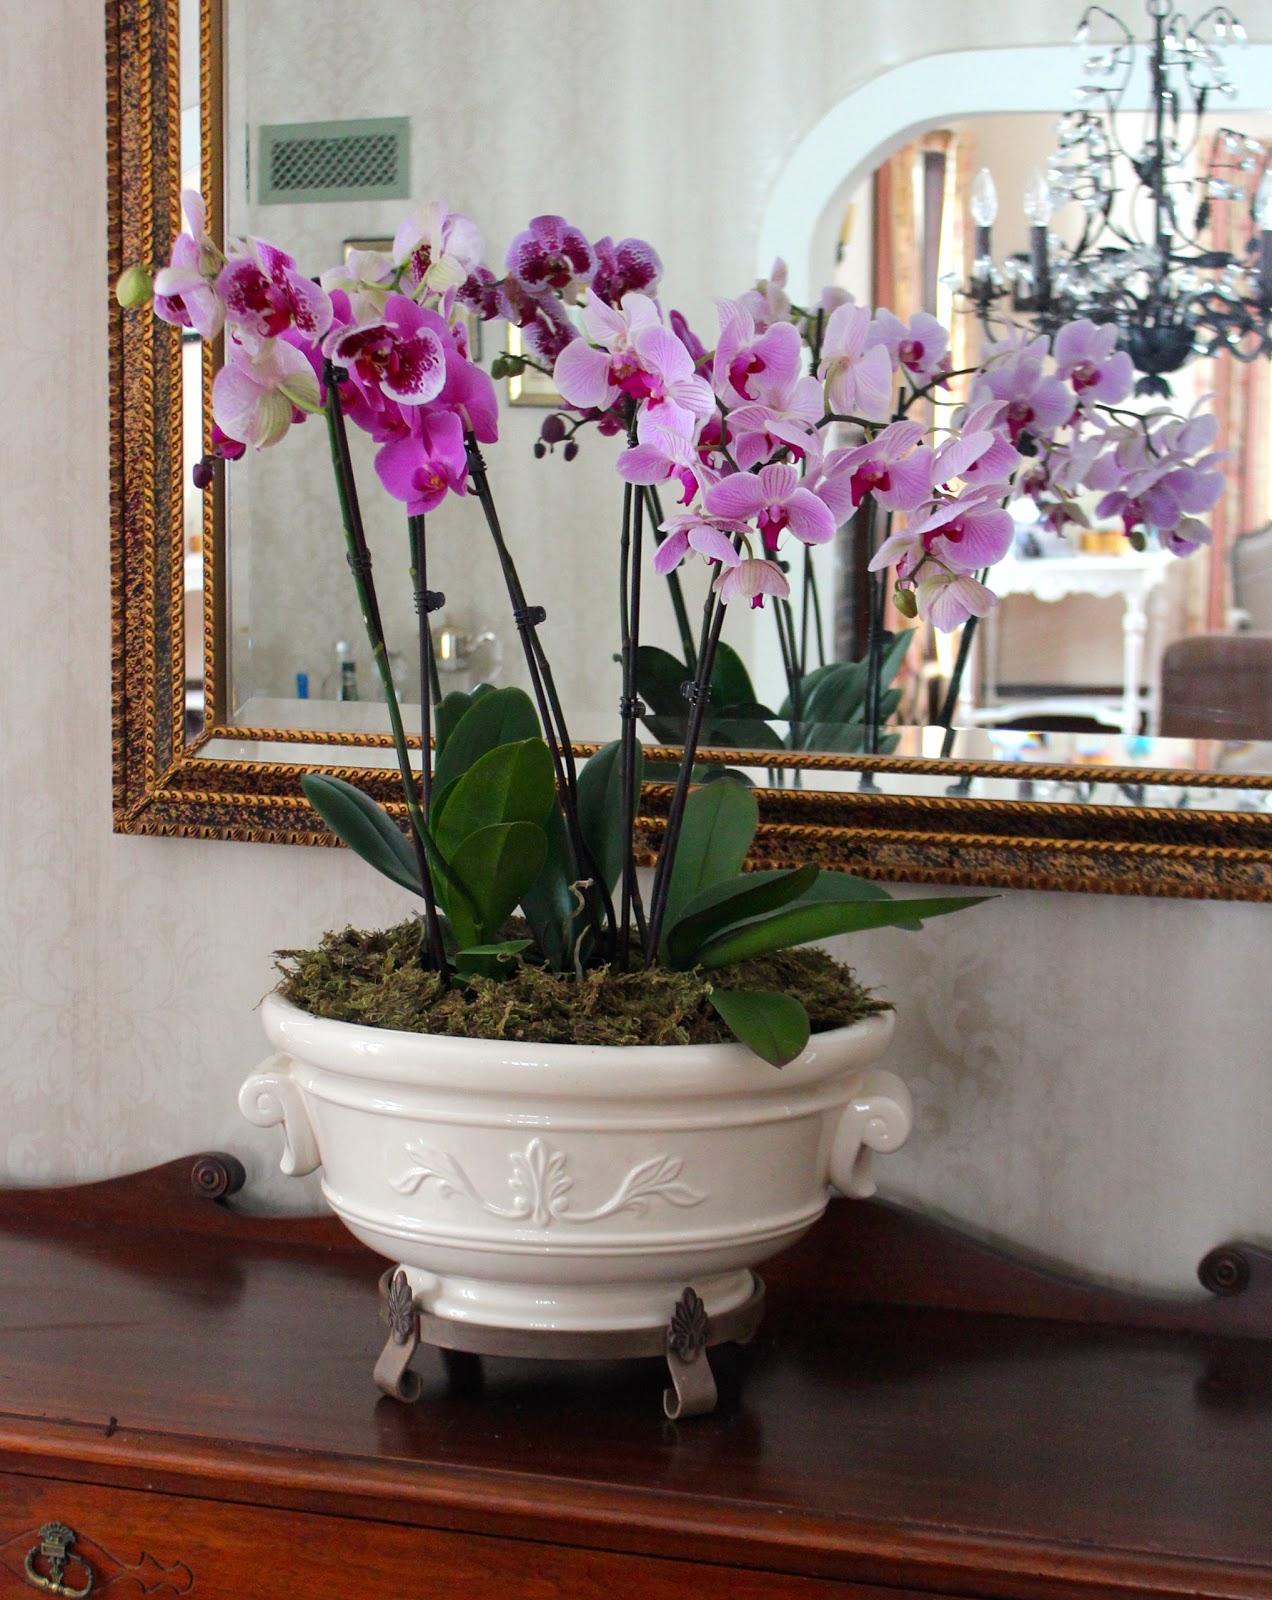 Орхидея в домашних условиях зимой